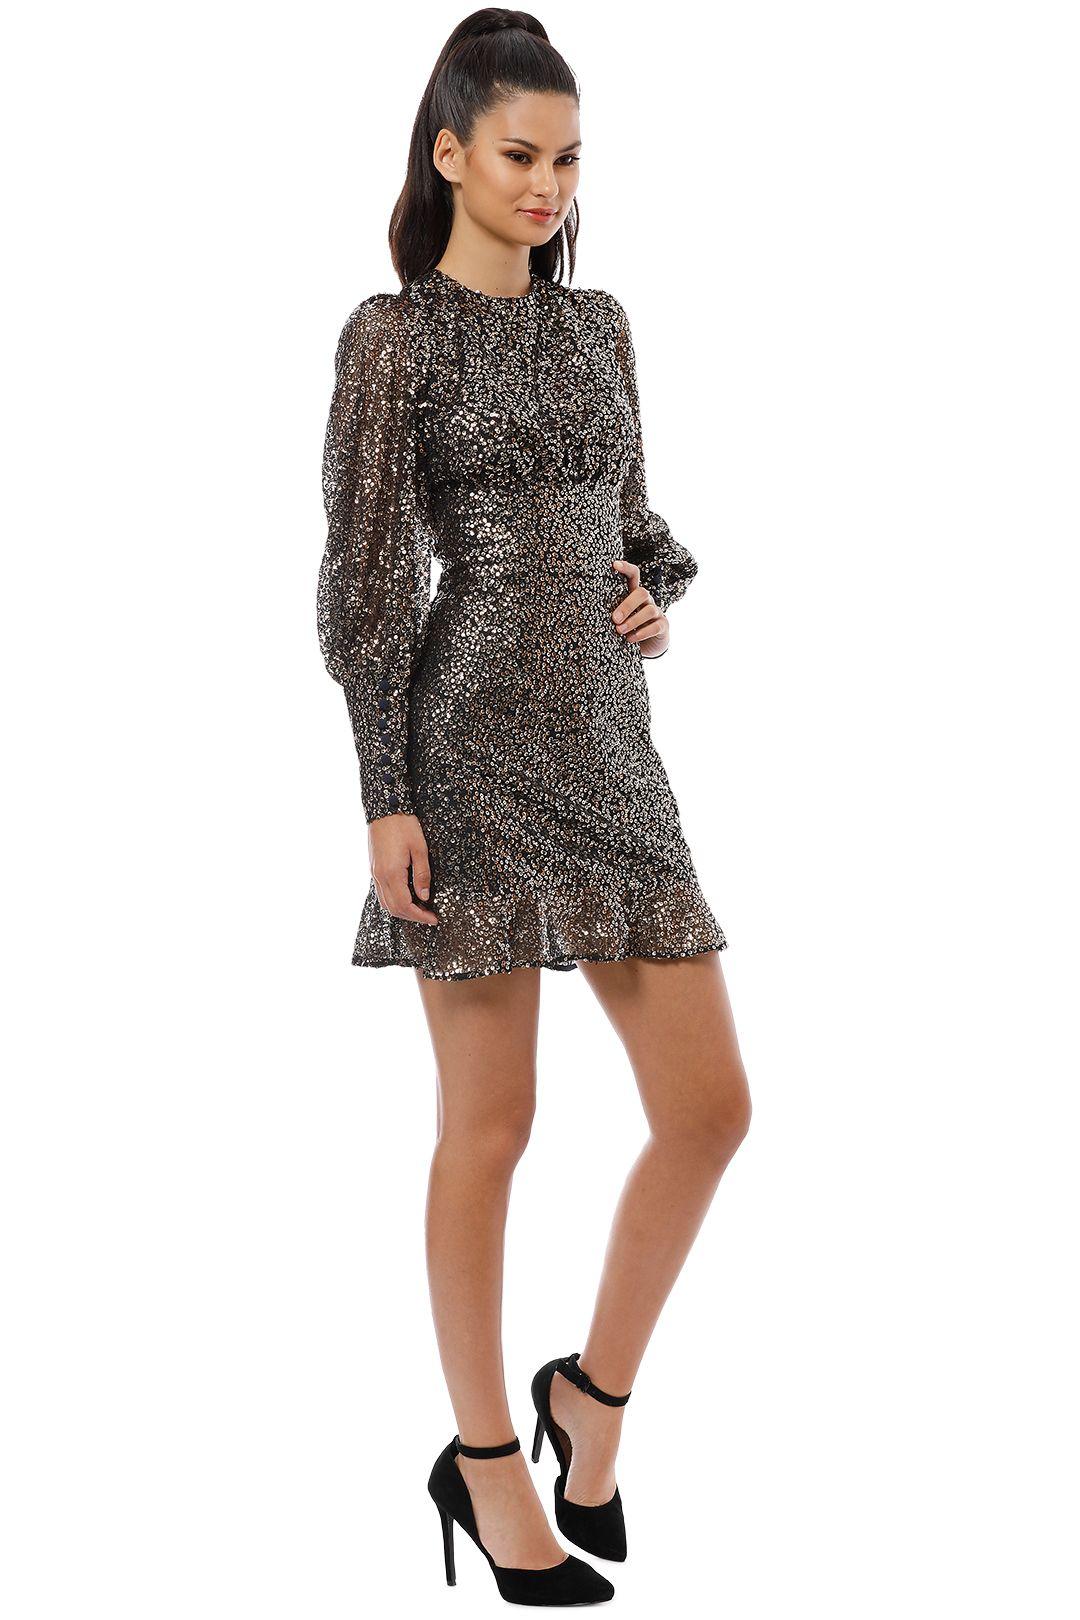 Misha Collection - Brielle Mini Dress - Black Gold - Side